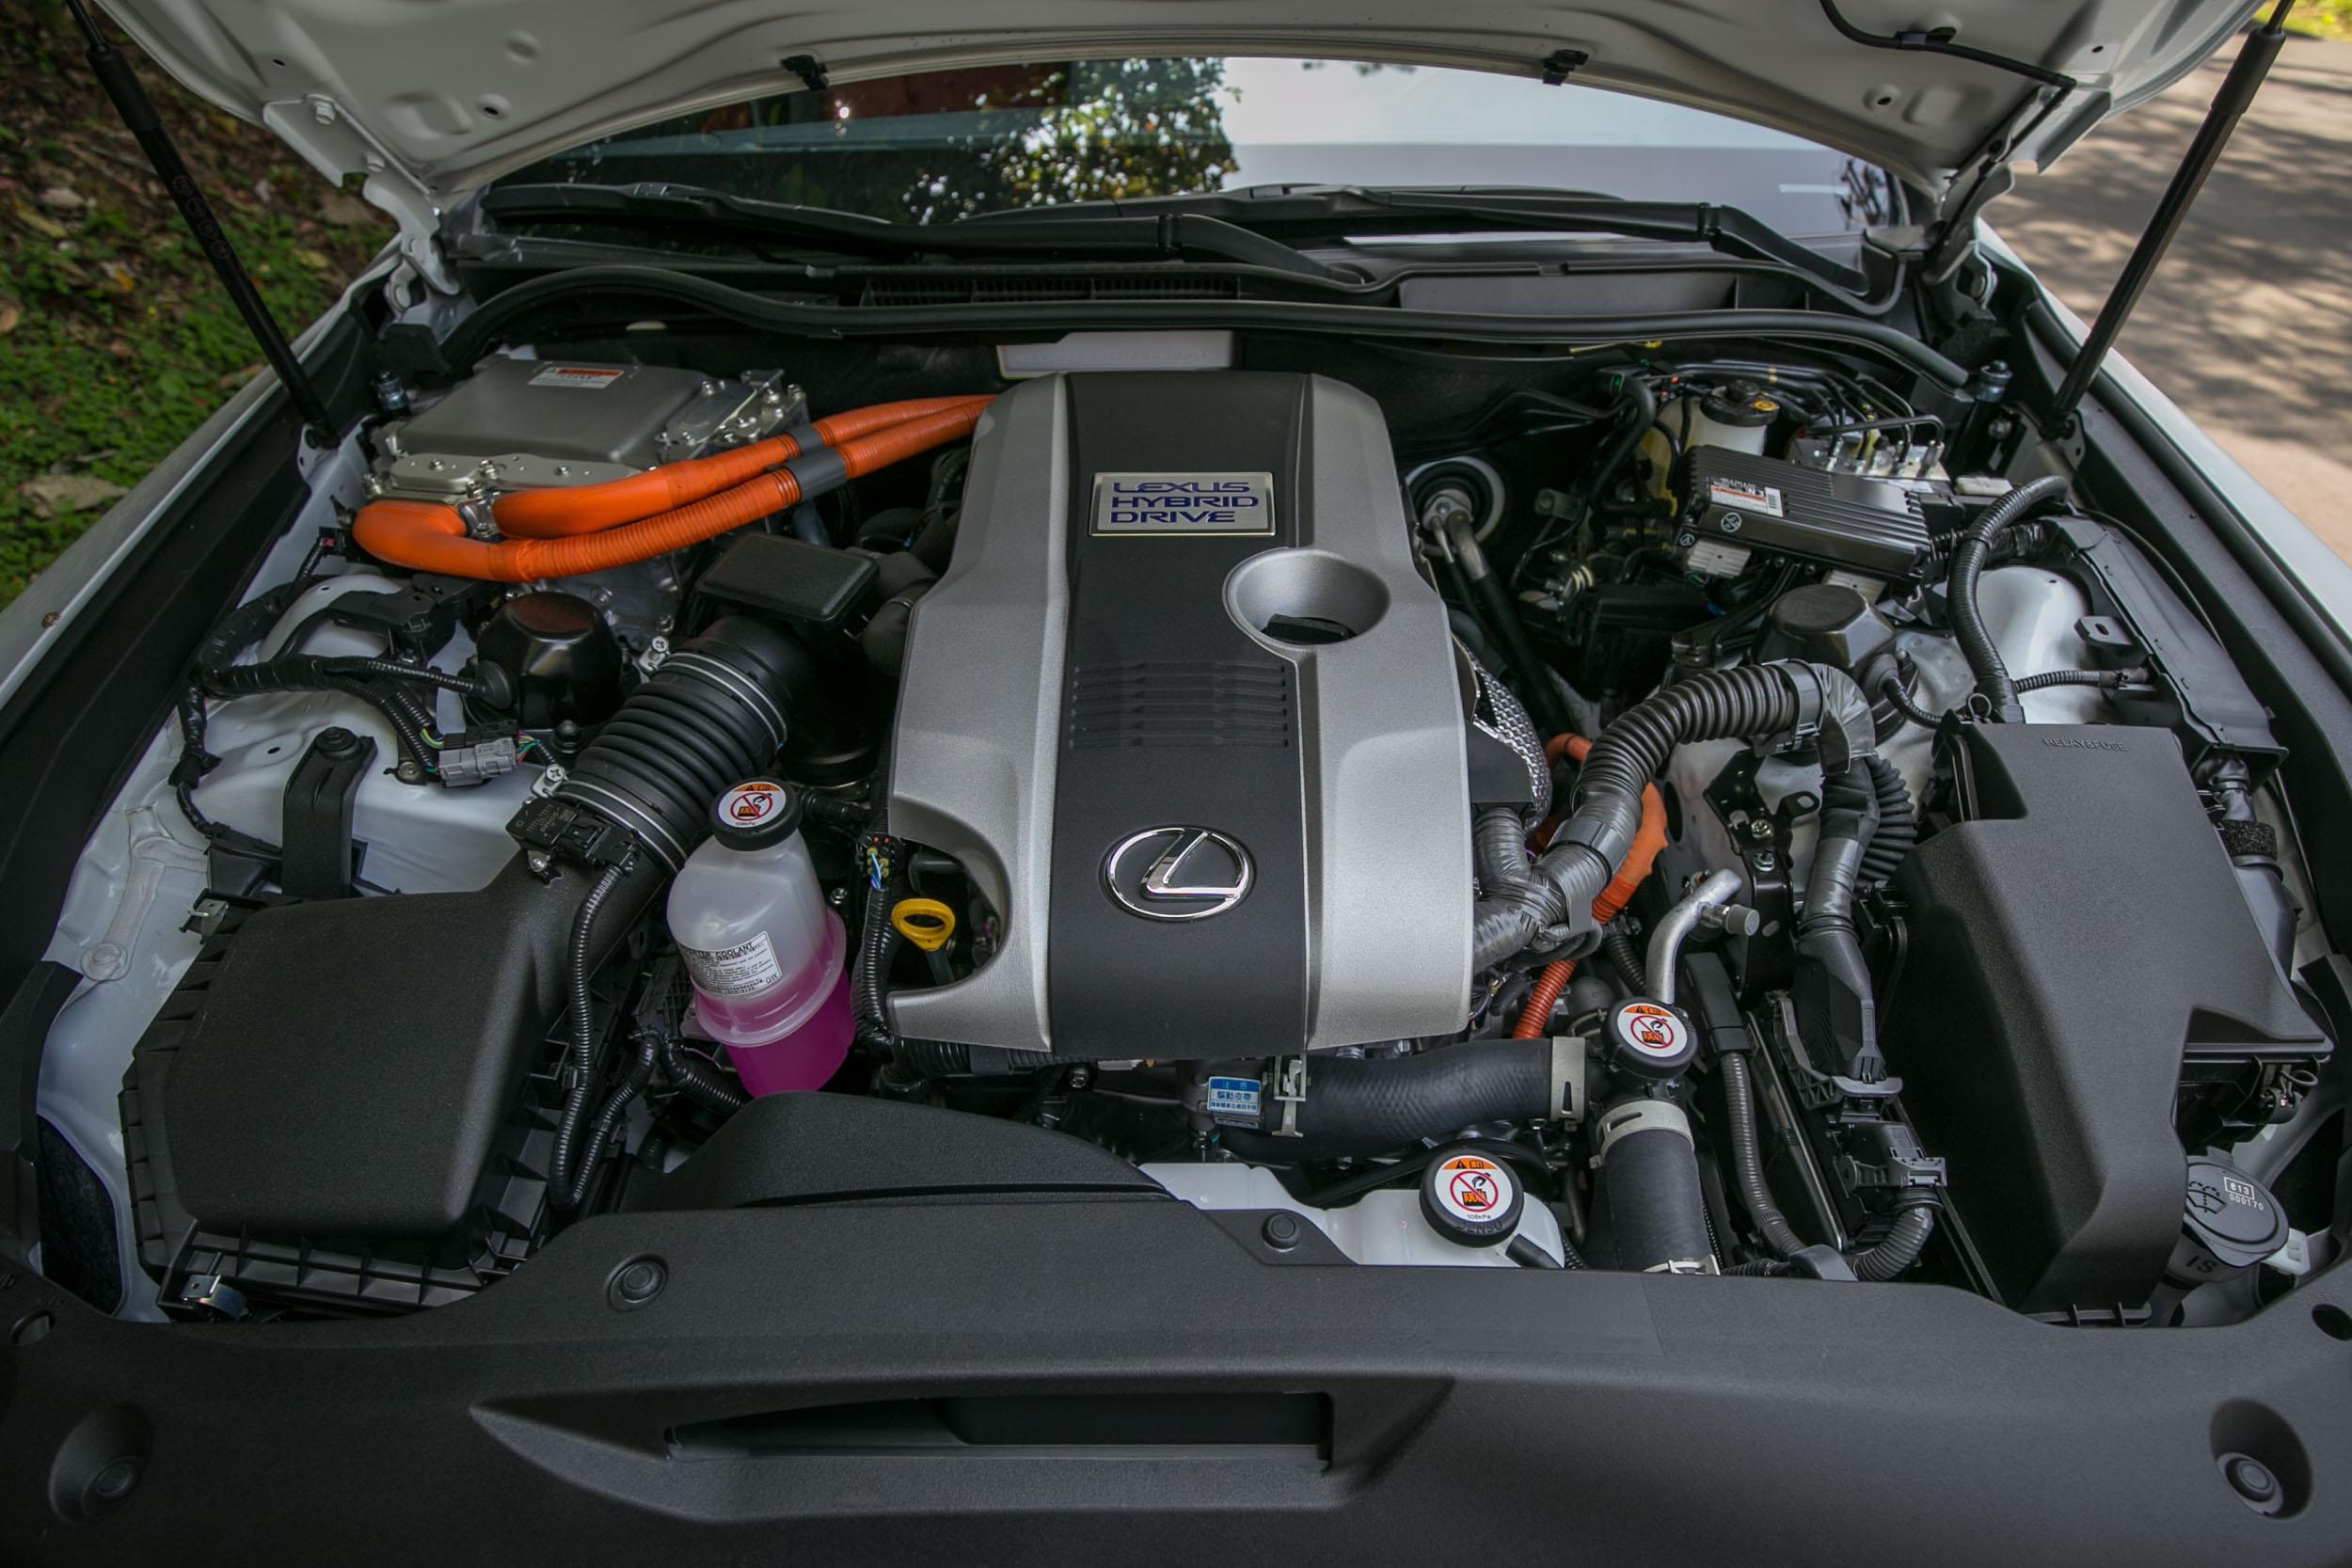 IS 300h F Sport搭載以 2.5 升汽油引擎為本體的油電動力系統,綜效輸出馬力為 223ps。